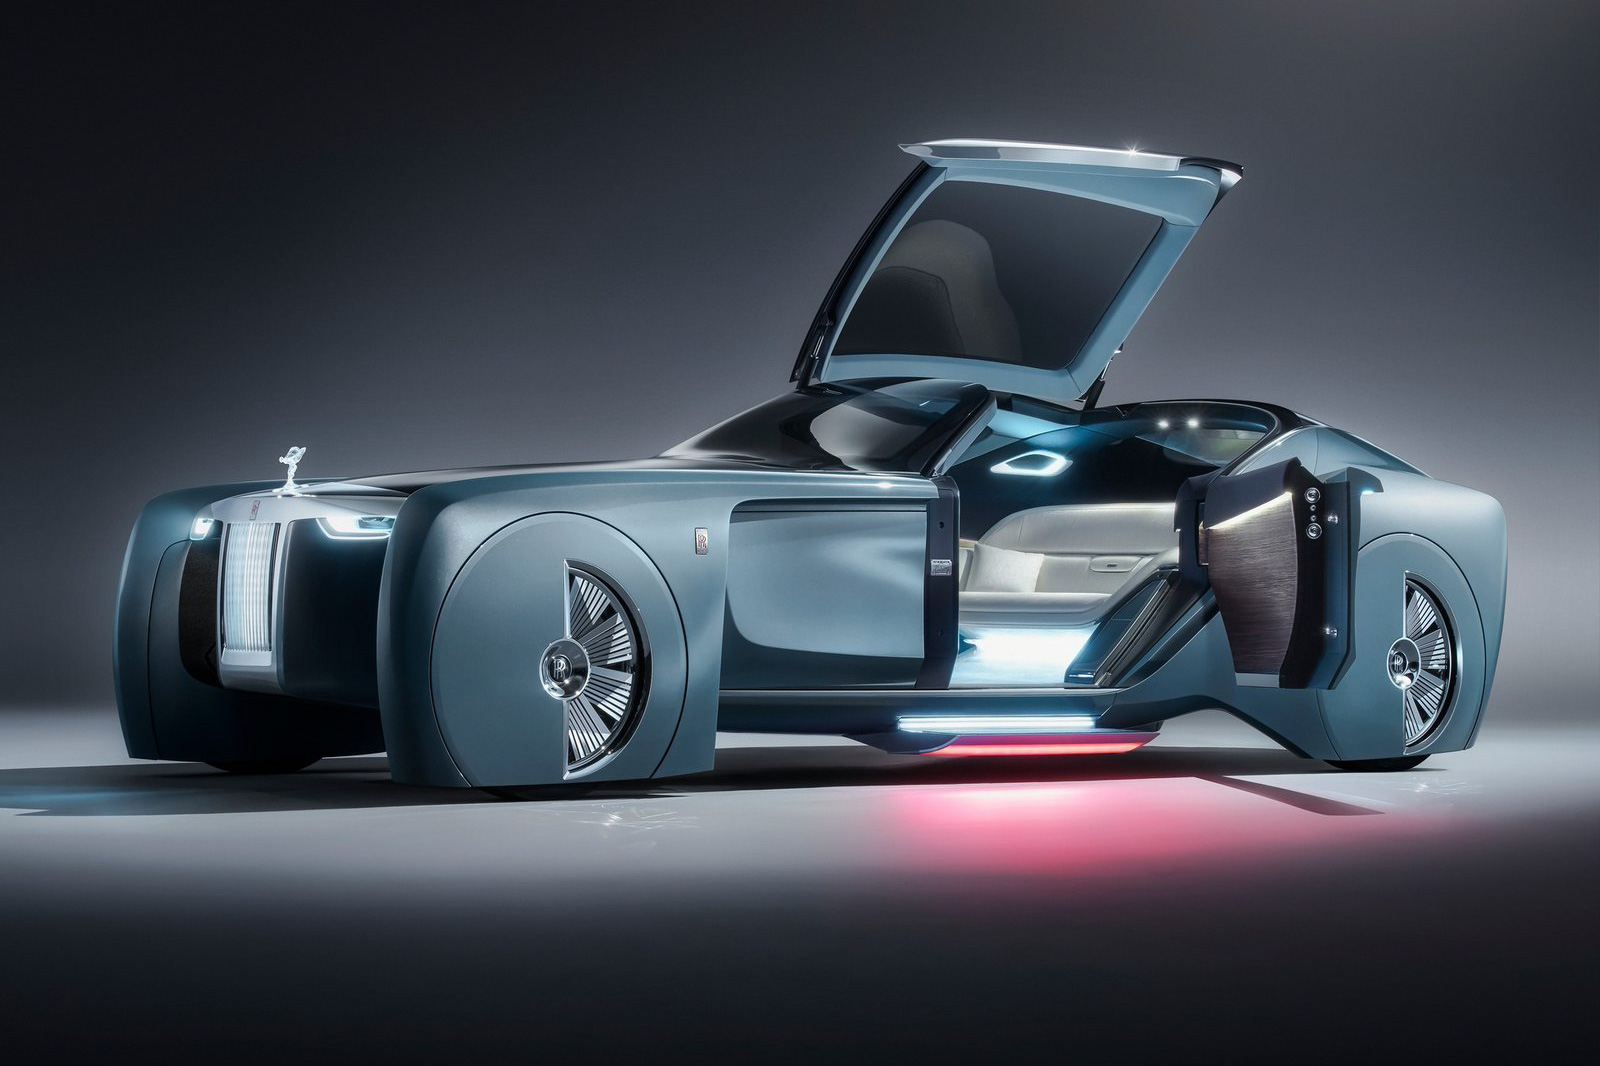 rolls-royce-103ex-vision-next-100-concept-2016-1600-03.jpg